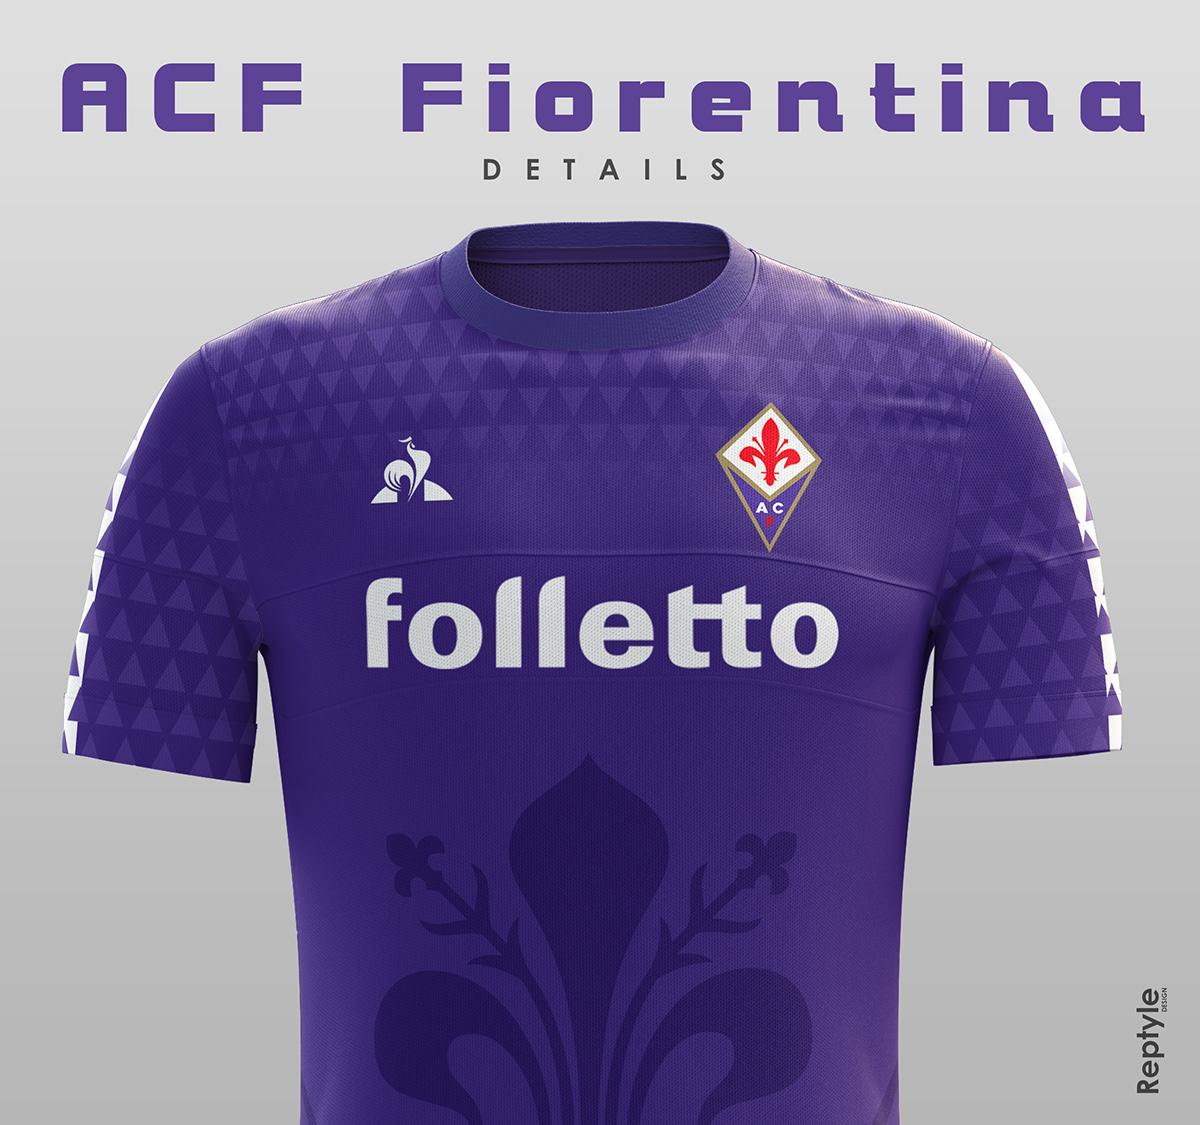 ACF Fiorentina soccer kit concept on Behance 4374d6181